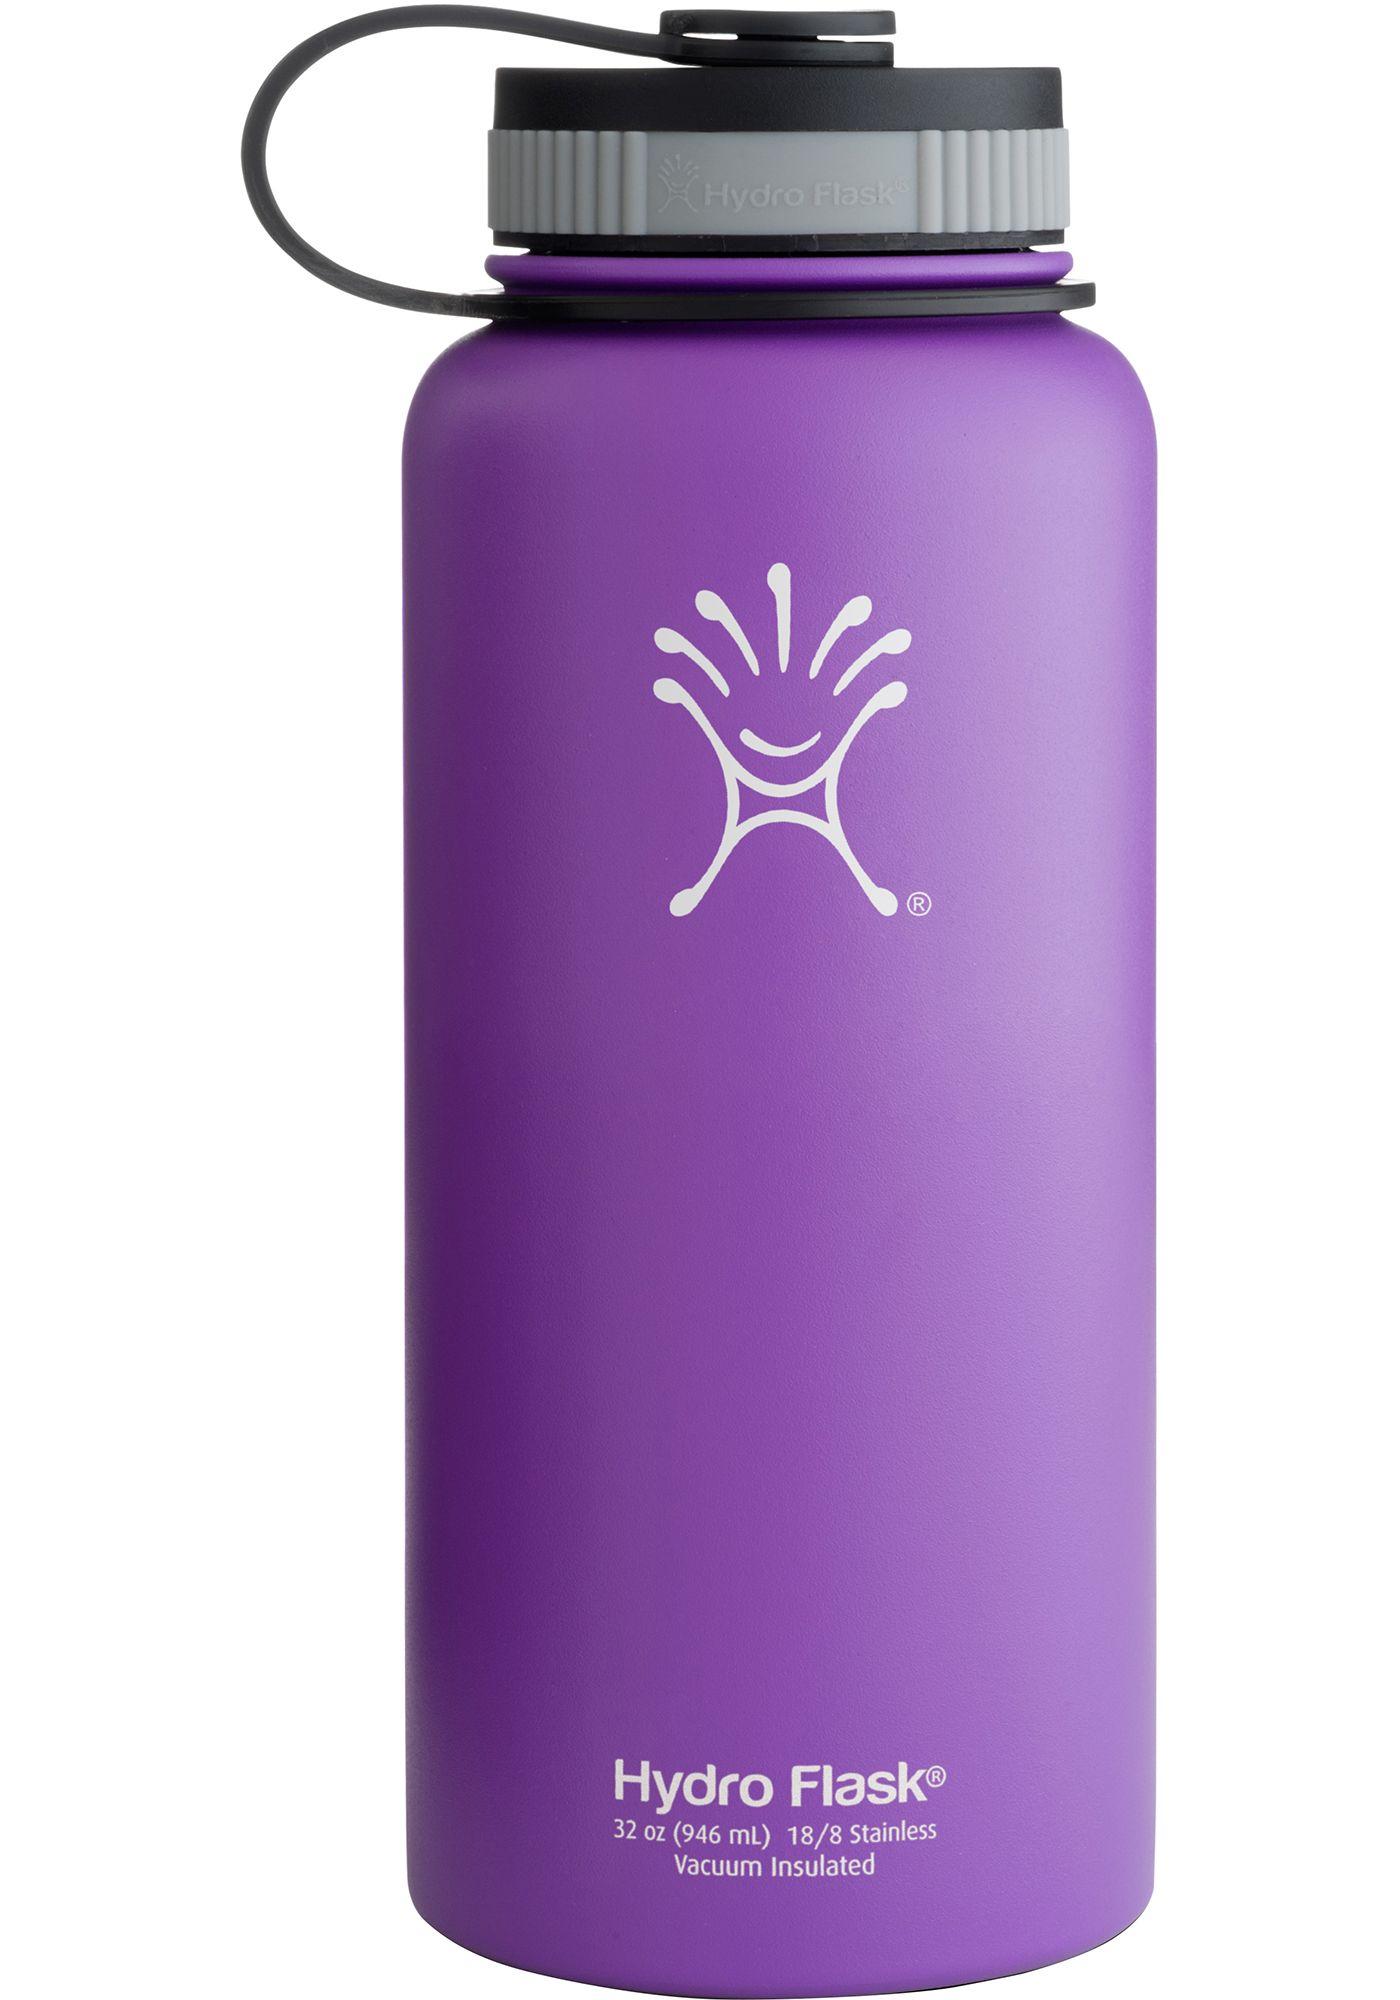 Hydro Flask 32 oz. Wide Mouth Bottle